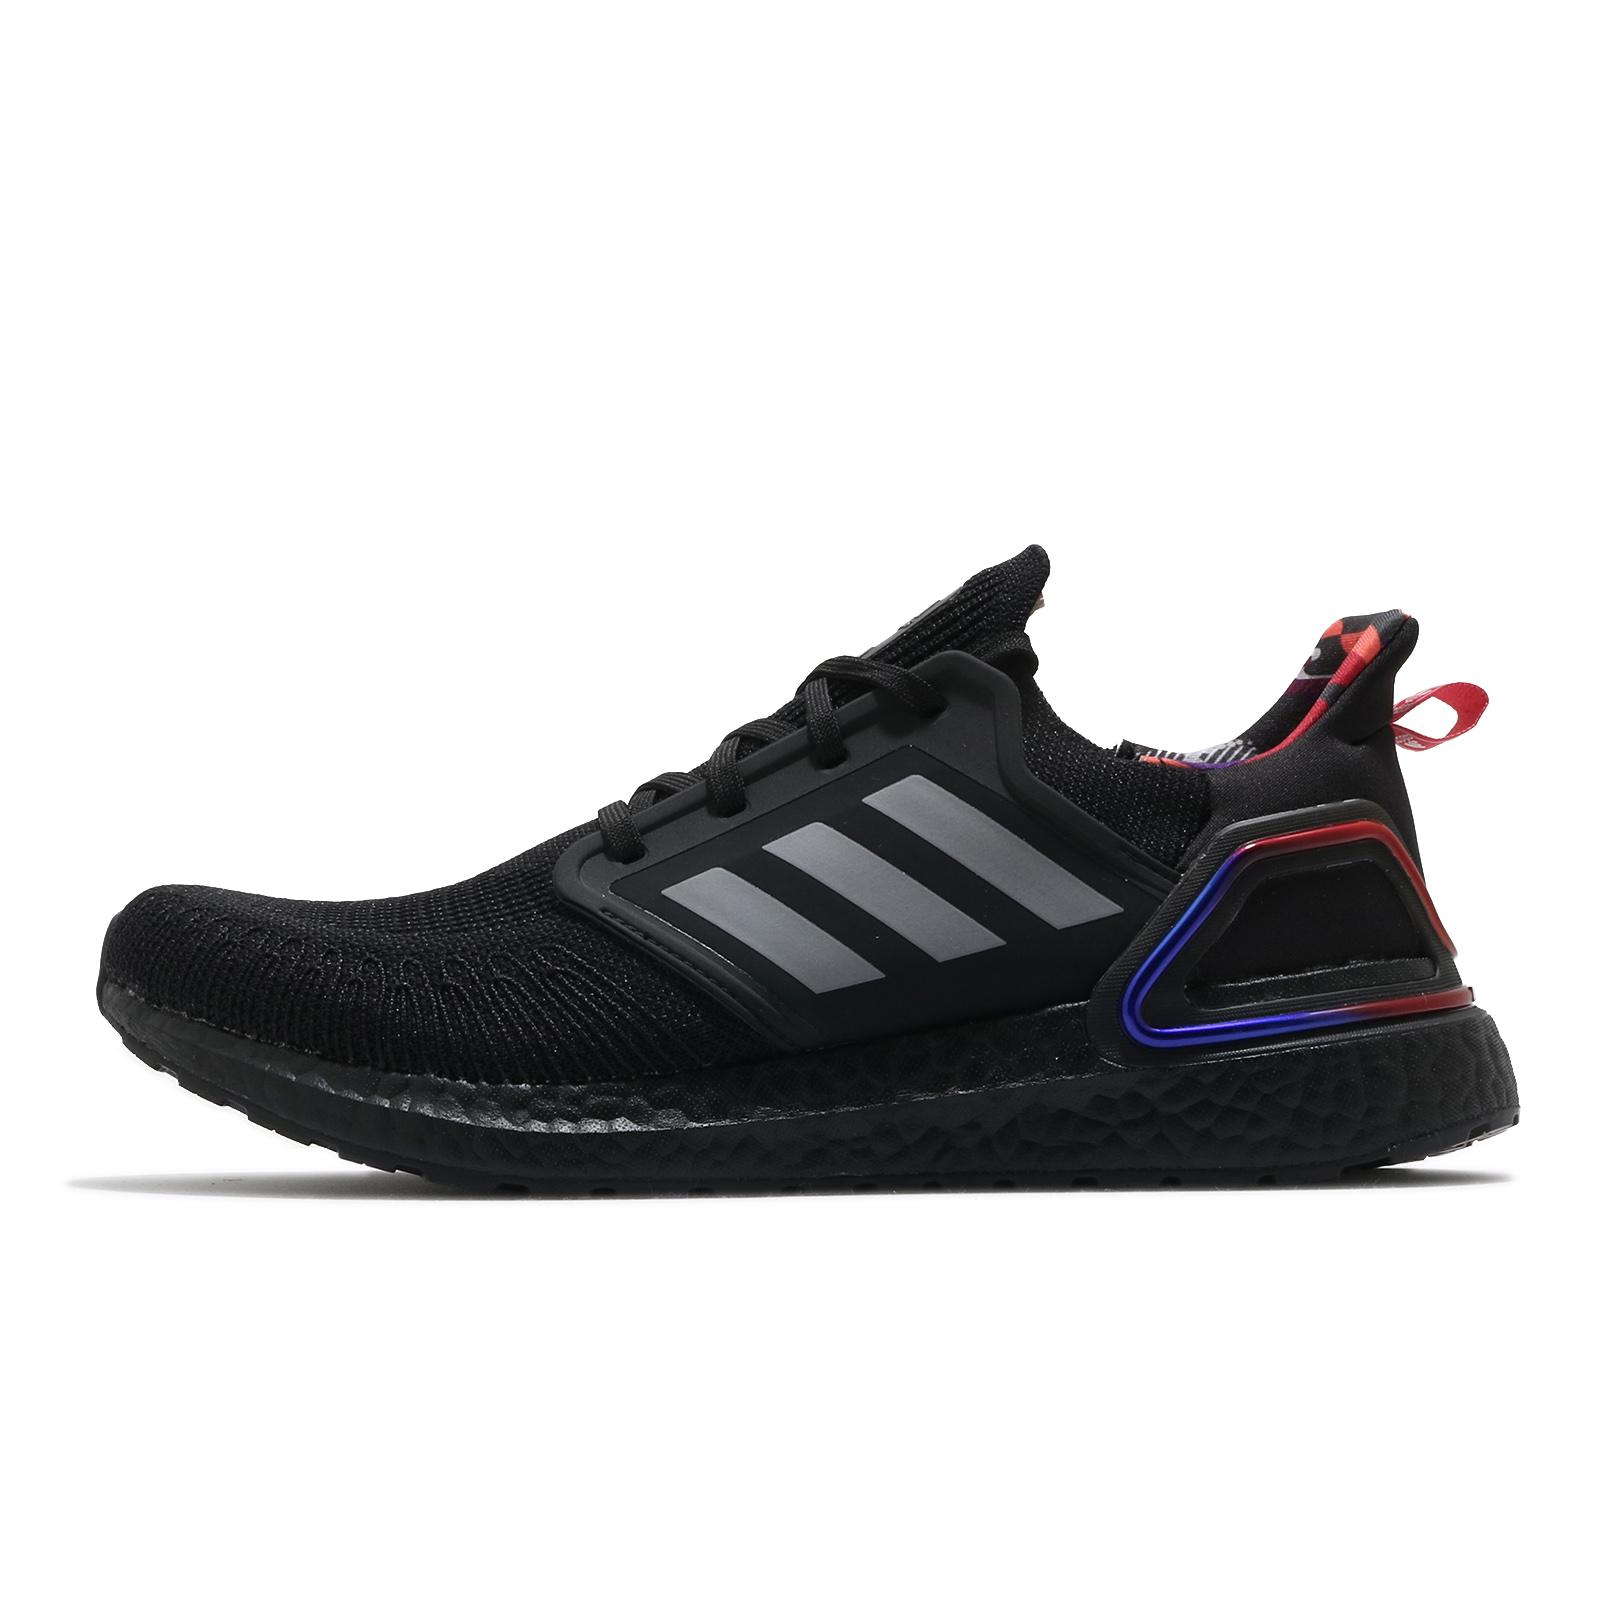 adidas 慢跑鞋 Ultraboost 20 黑 藍 紅 CNY 中國新年 男鞋 BOOST【ACS】 GZ7606